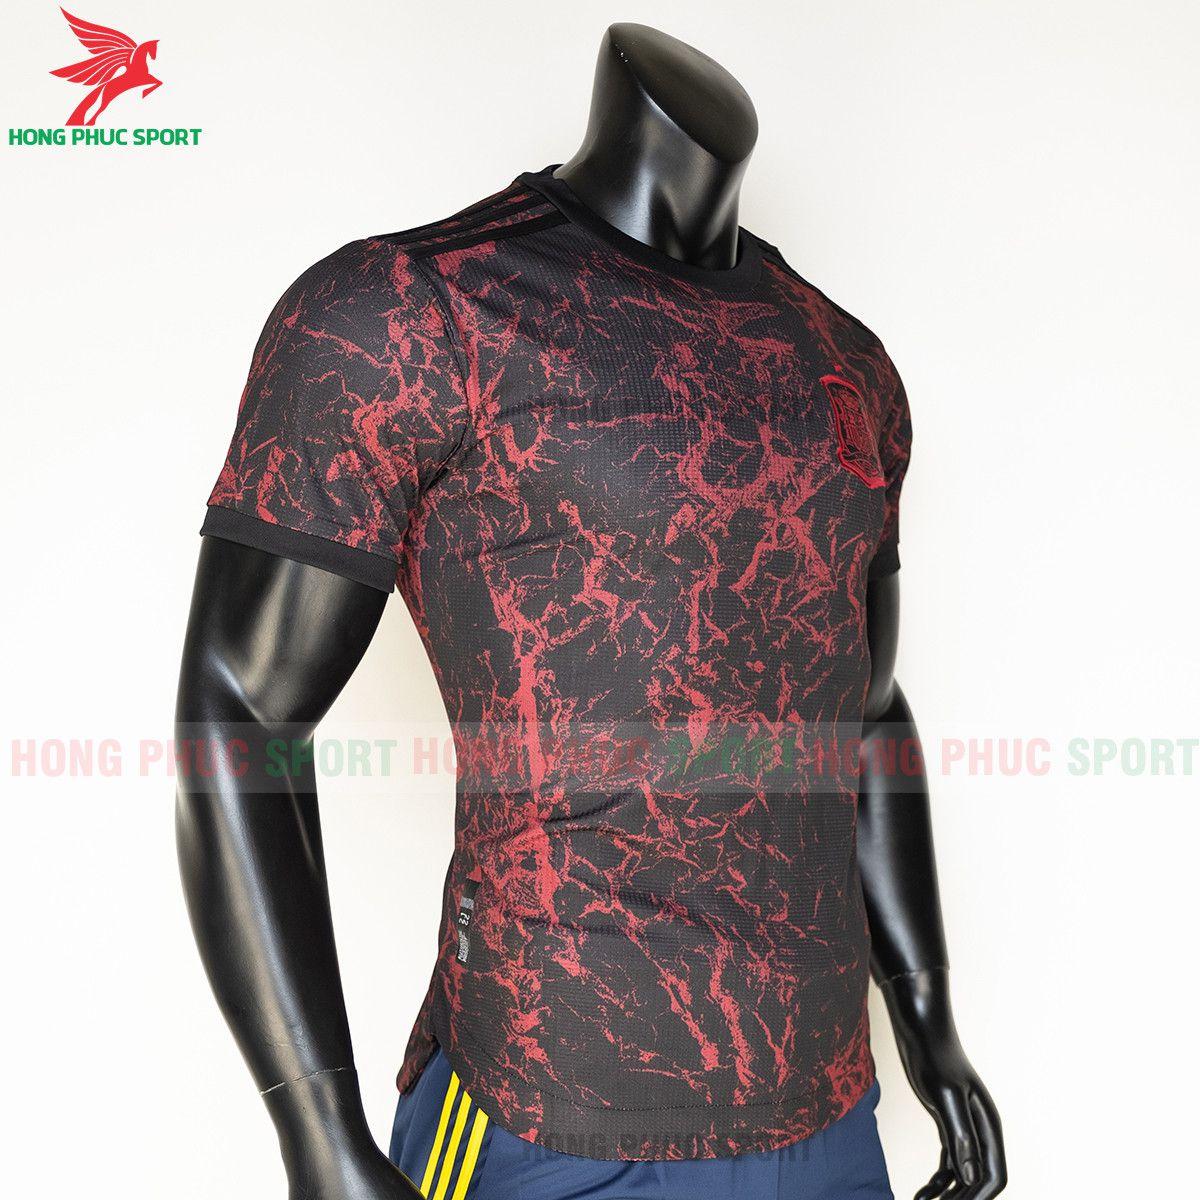 https://cdn.hongphucsport.com/unsafe/s4.shopbay.vn/files/285/ao-bong-da-training-tuyen-tay-ban-nha-euro-2021-thailand-3-61558c4e90032.jpg